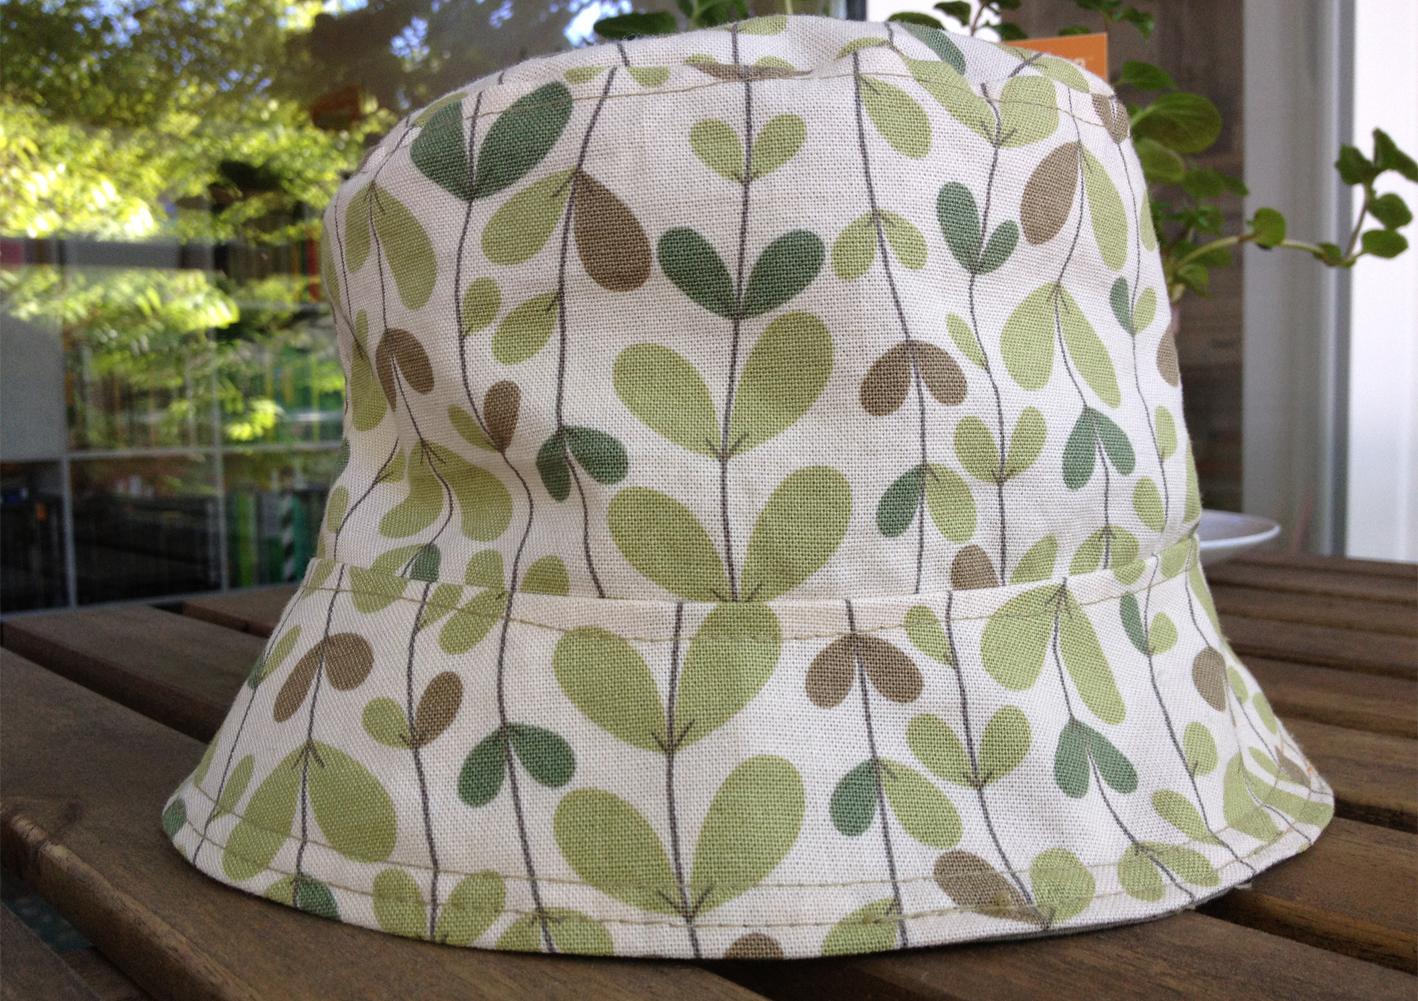 childrens-hat-hand-sewn.jpg